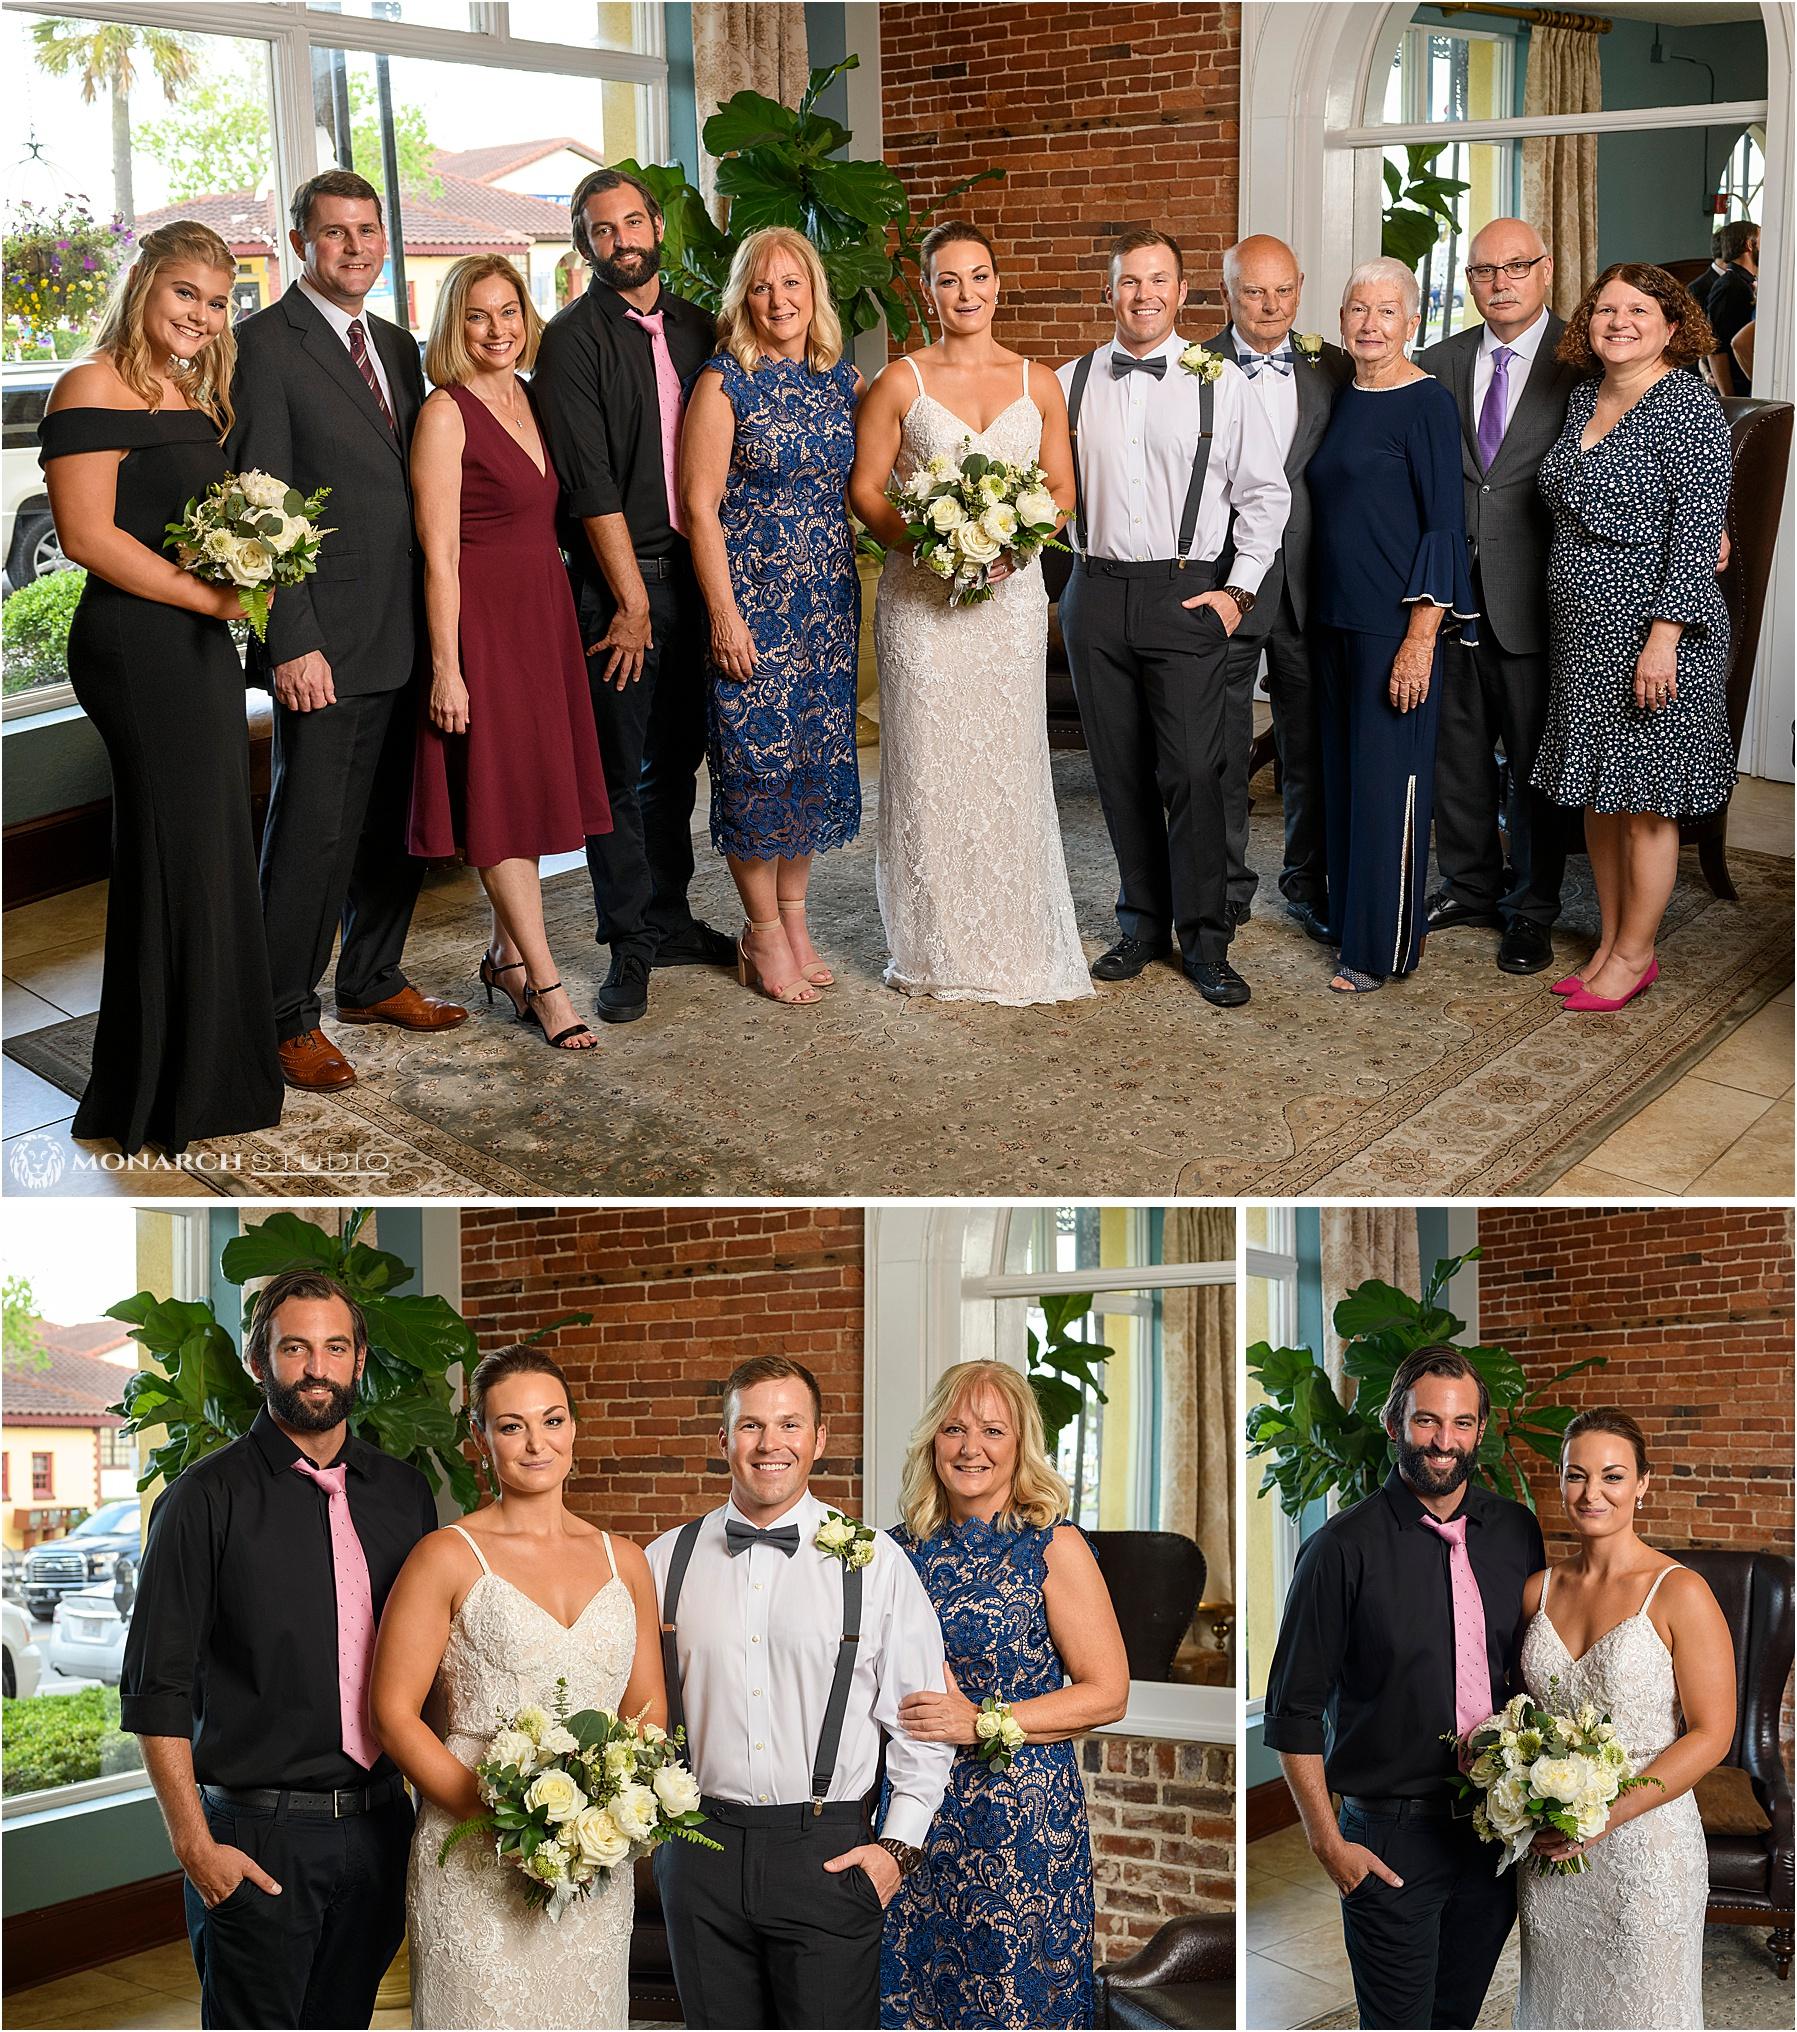 084-whiteroom-wedding-photographer-2019-05-22_0066.jpg